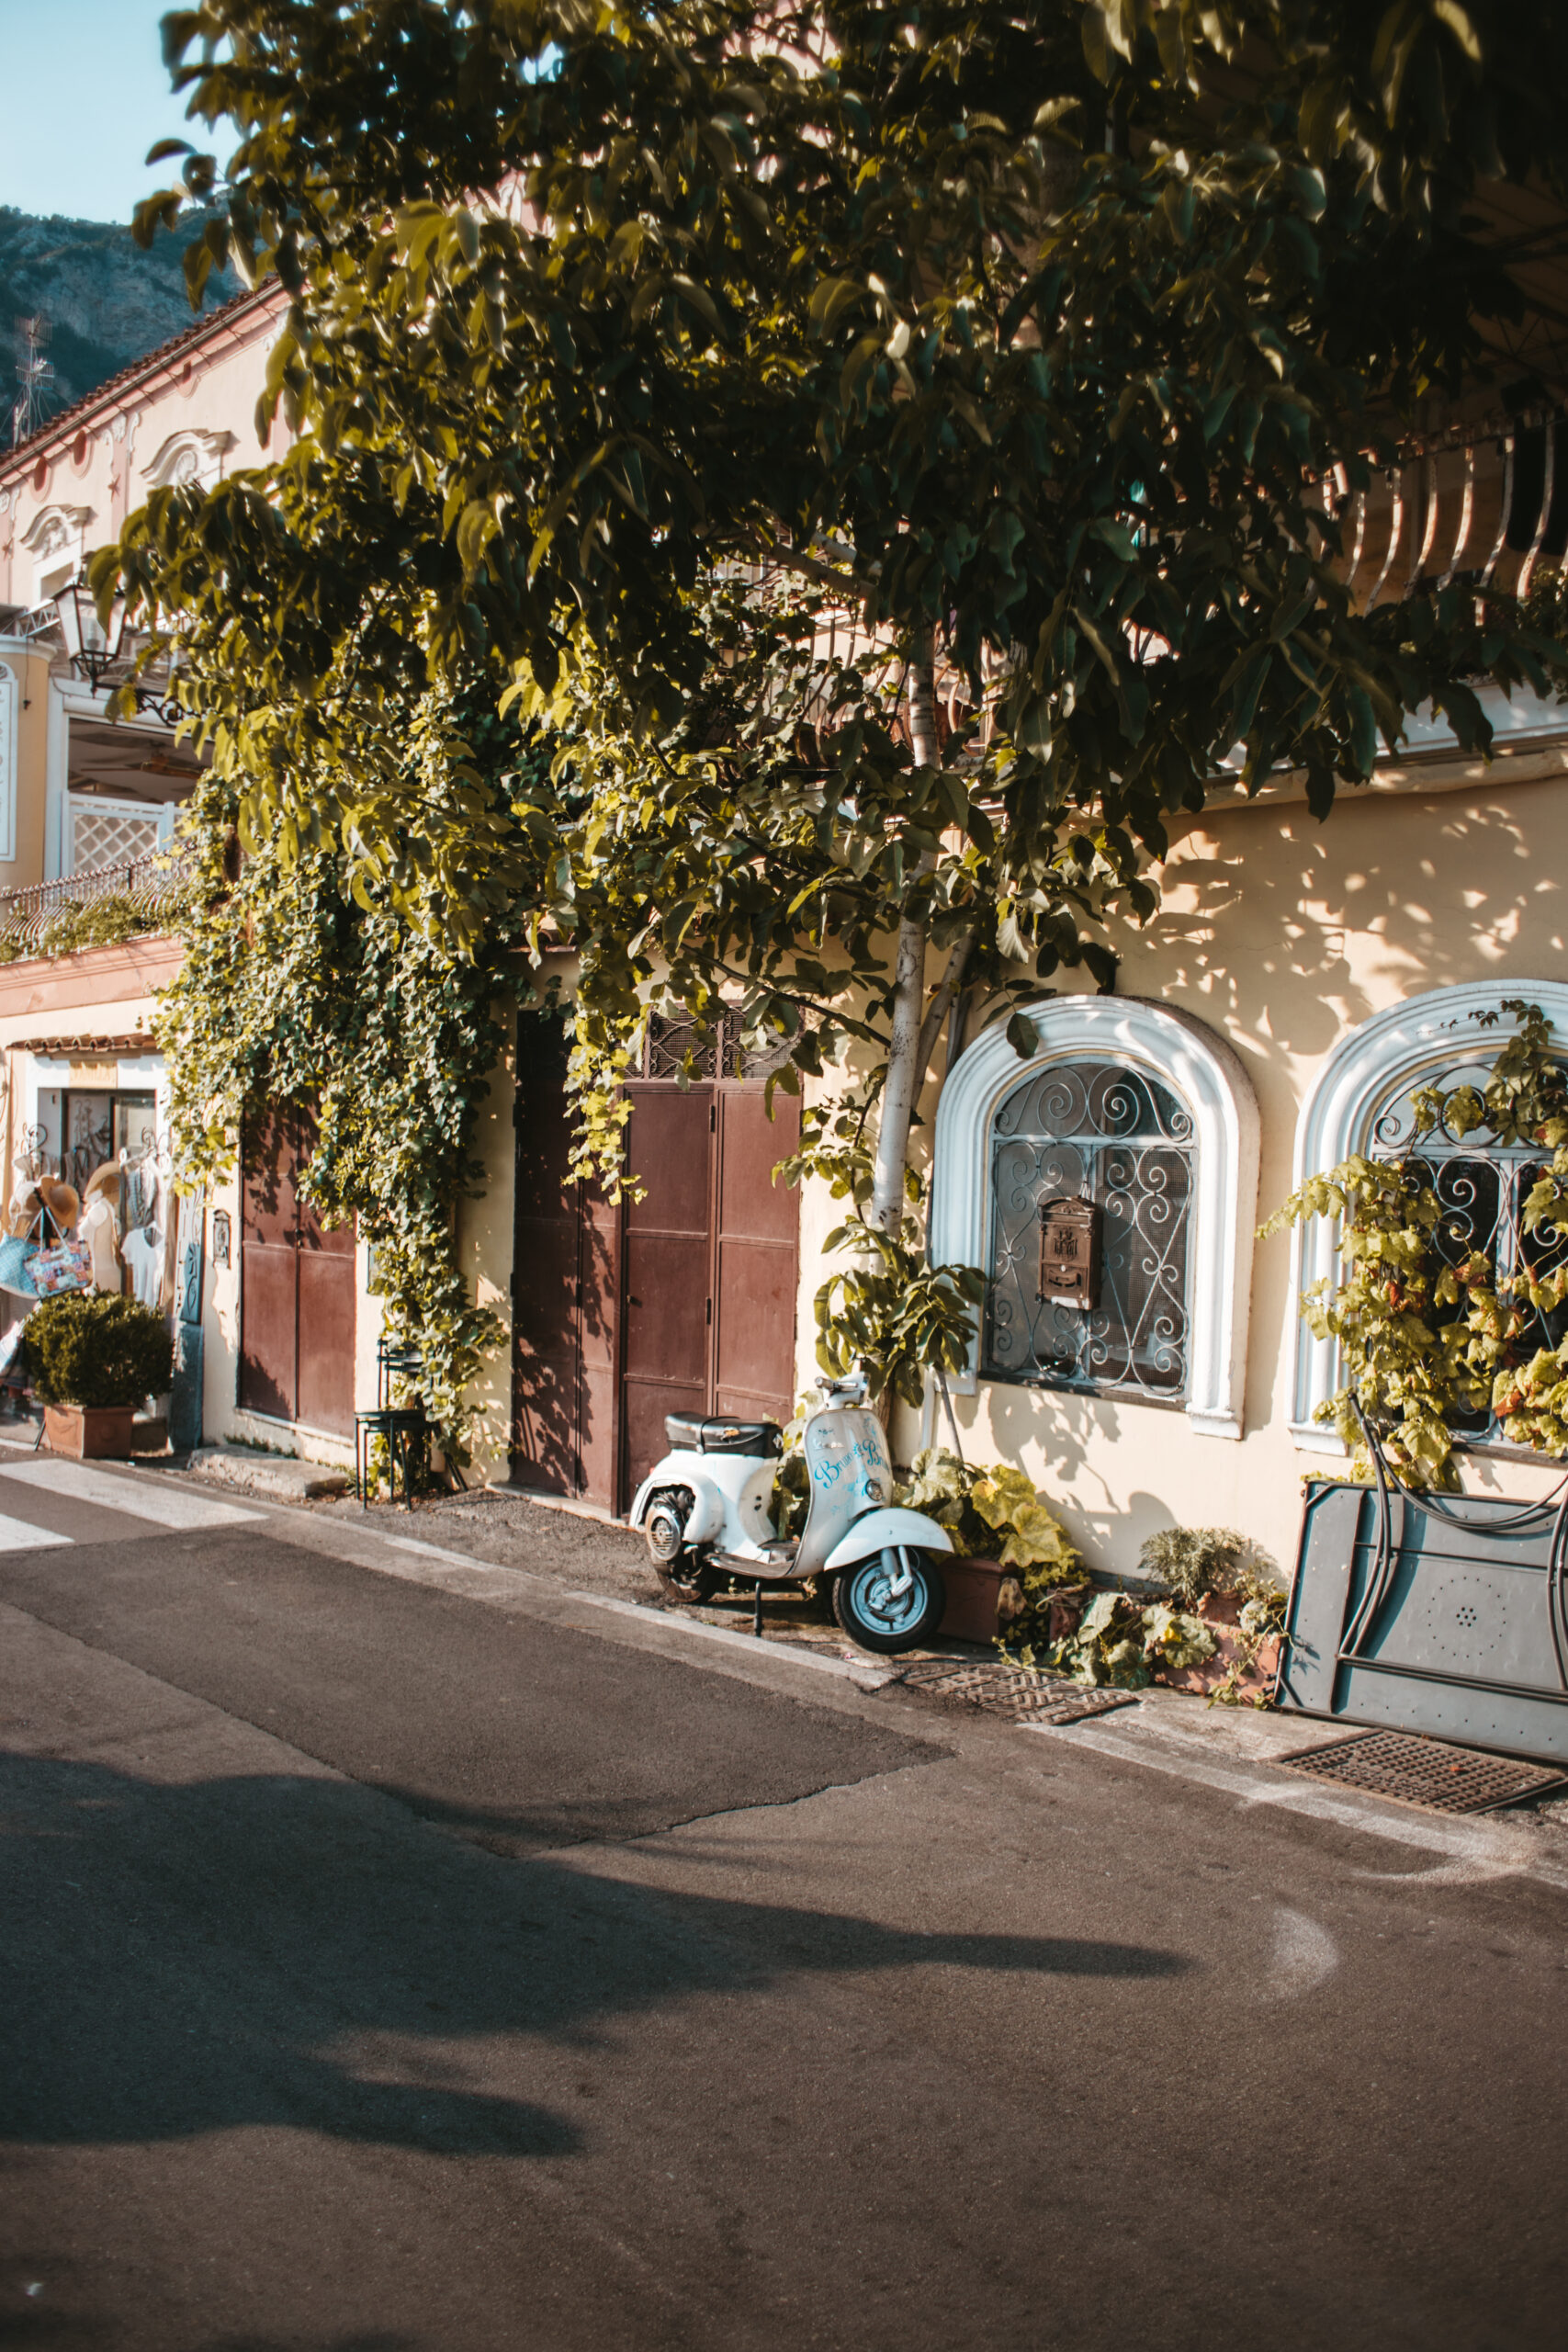 Positano uliczka, motor, domek, wybrzeże Amalfi, Amalfi Coast Italy